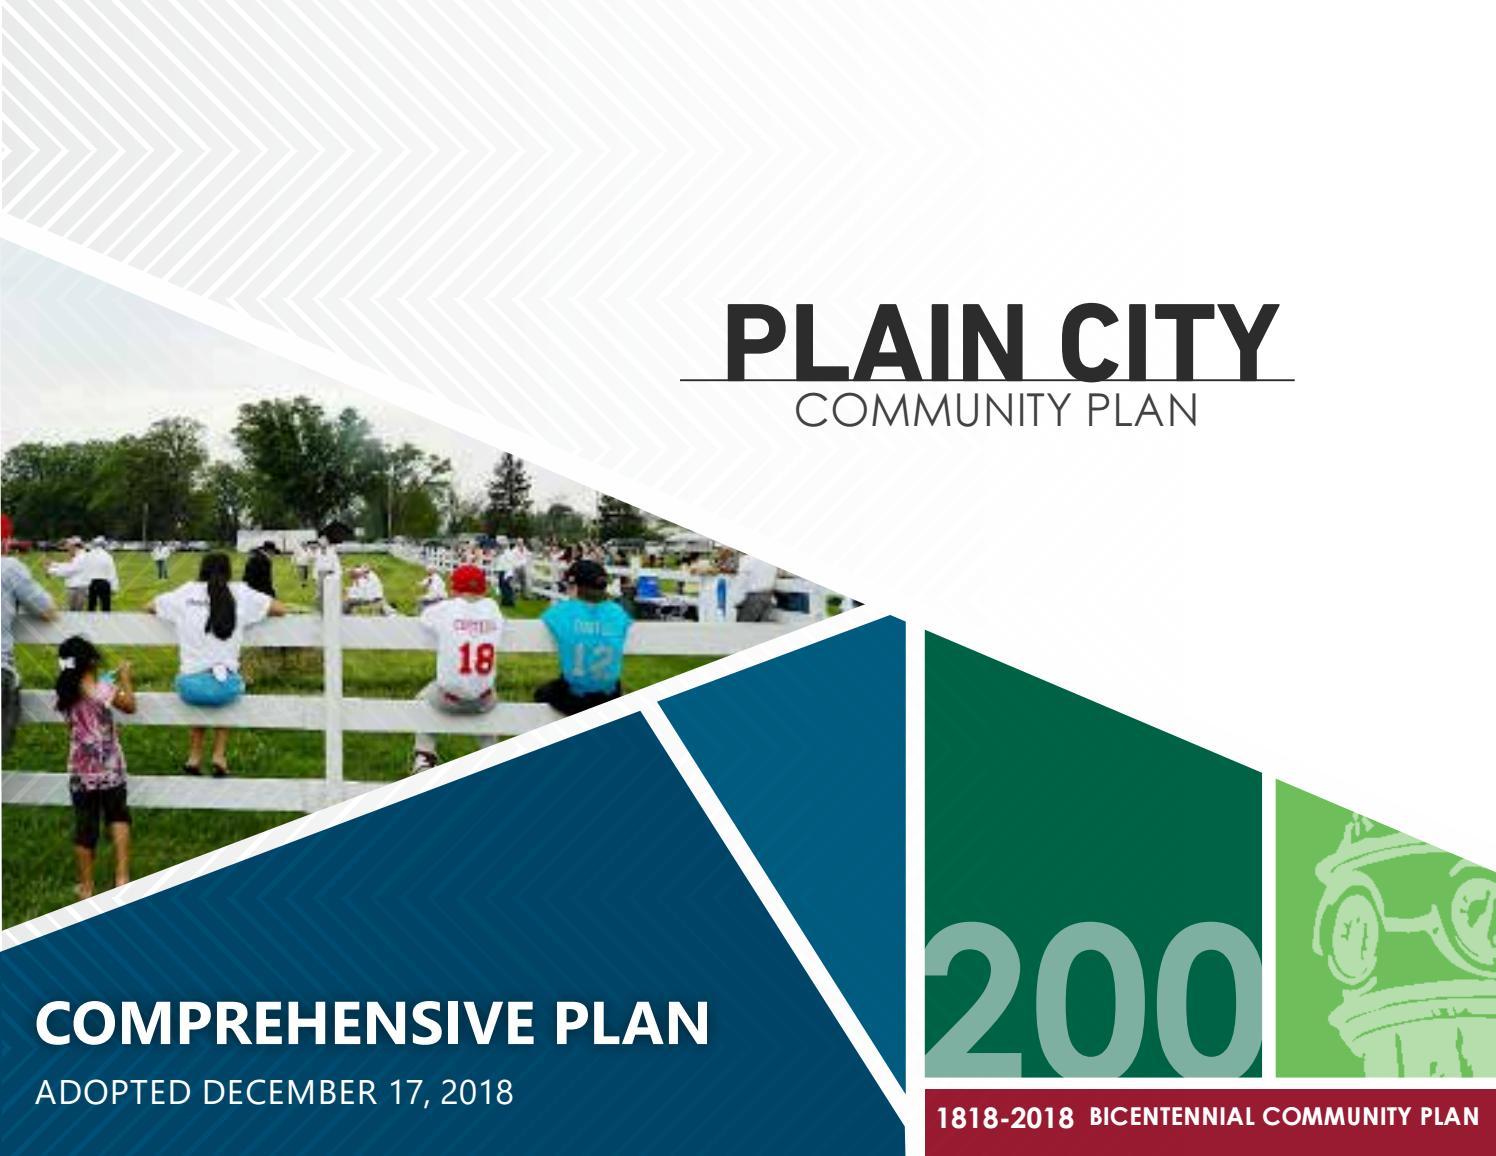 Plain City 2018 Bicentennial Community Plan Comprehensive Plan By Devon Mayhugh Issuu